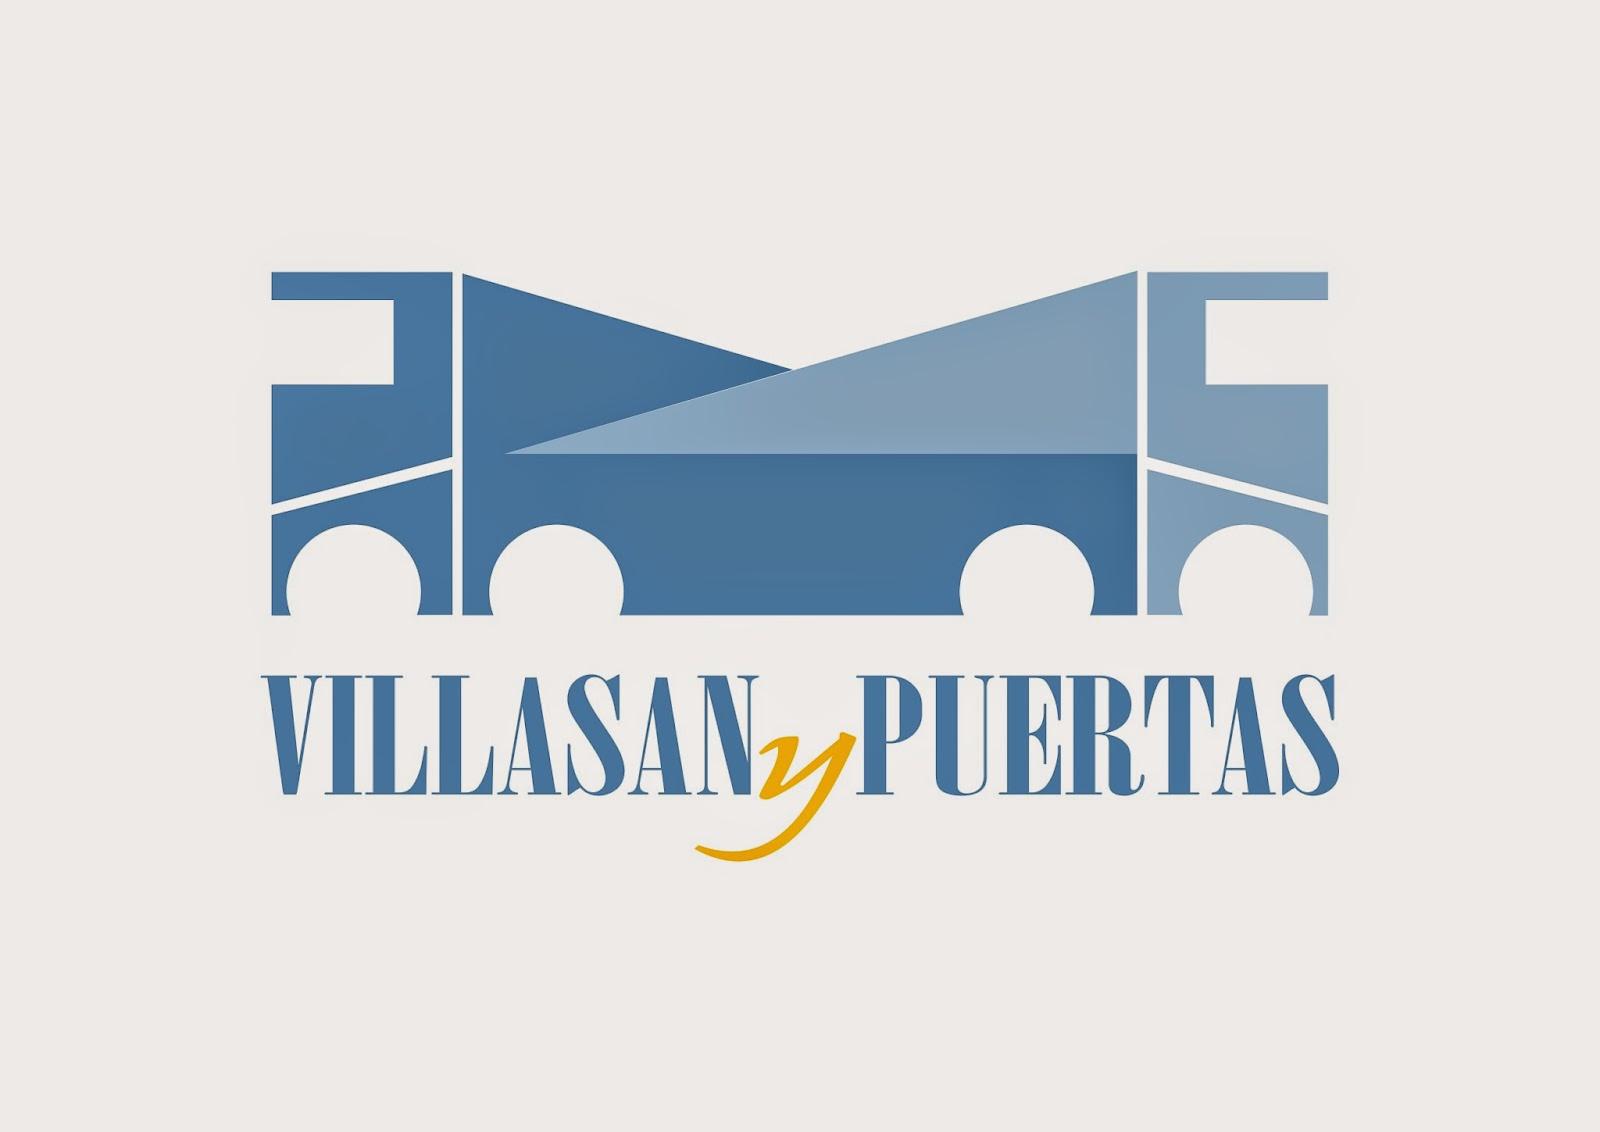 http://europaschoollinks.blogspot.com/2014/09/villasan-y-puertas-agencia-de.html